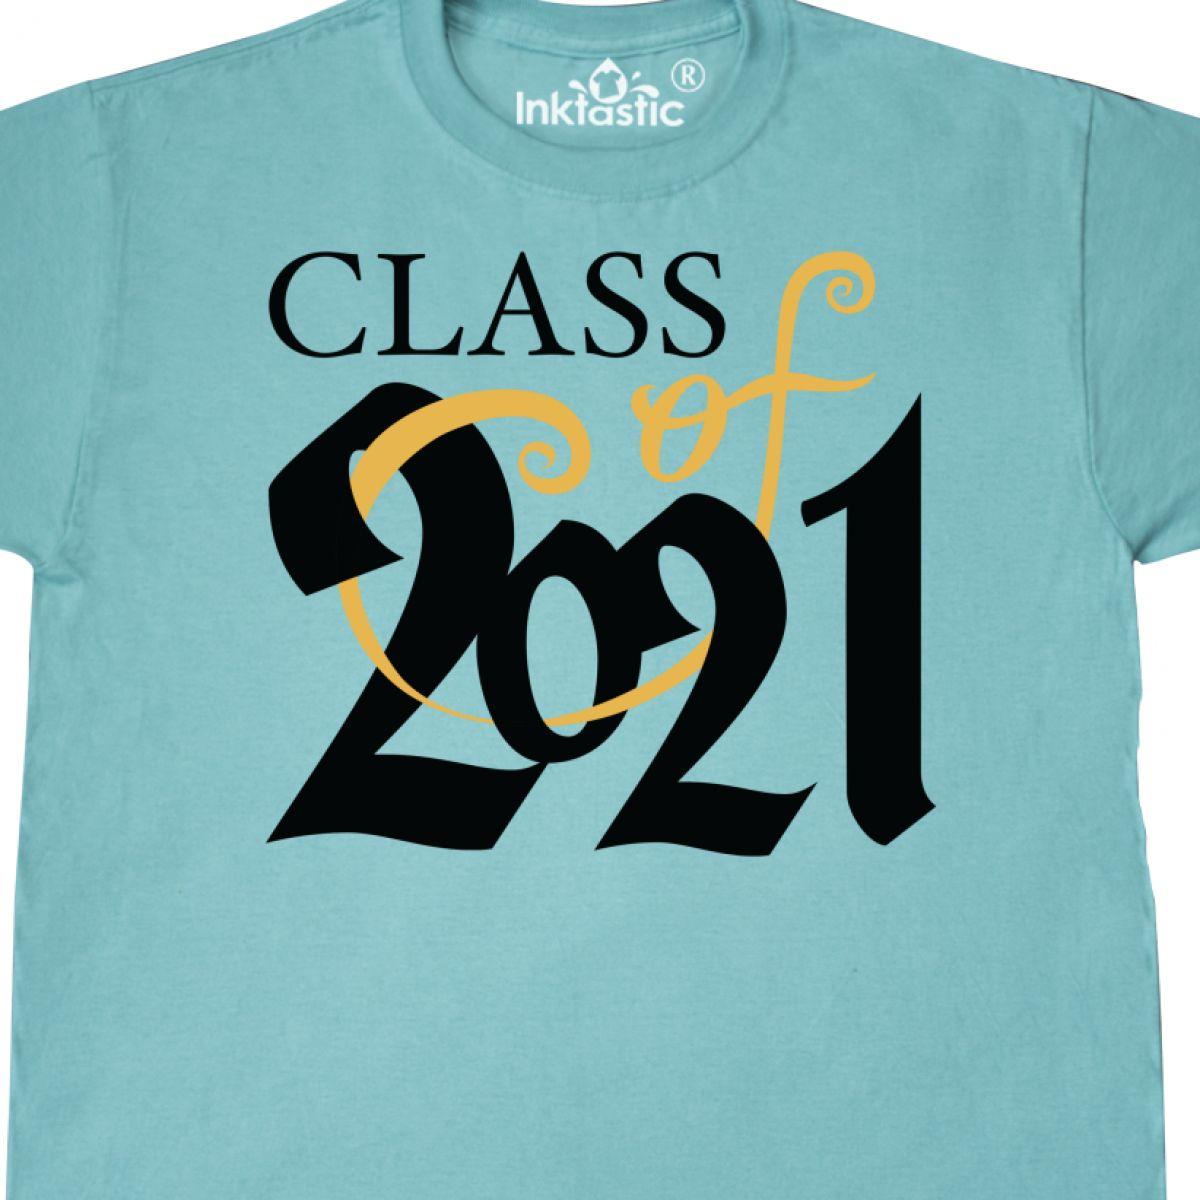 5cb45969 Schools Hightstown High School High School Class Of 2021: Inktastic Class  Of 2021 T-Shirt Graduation Graduate Senior